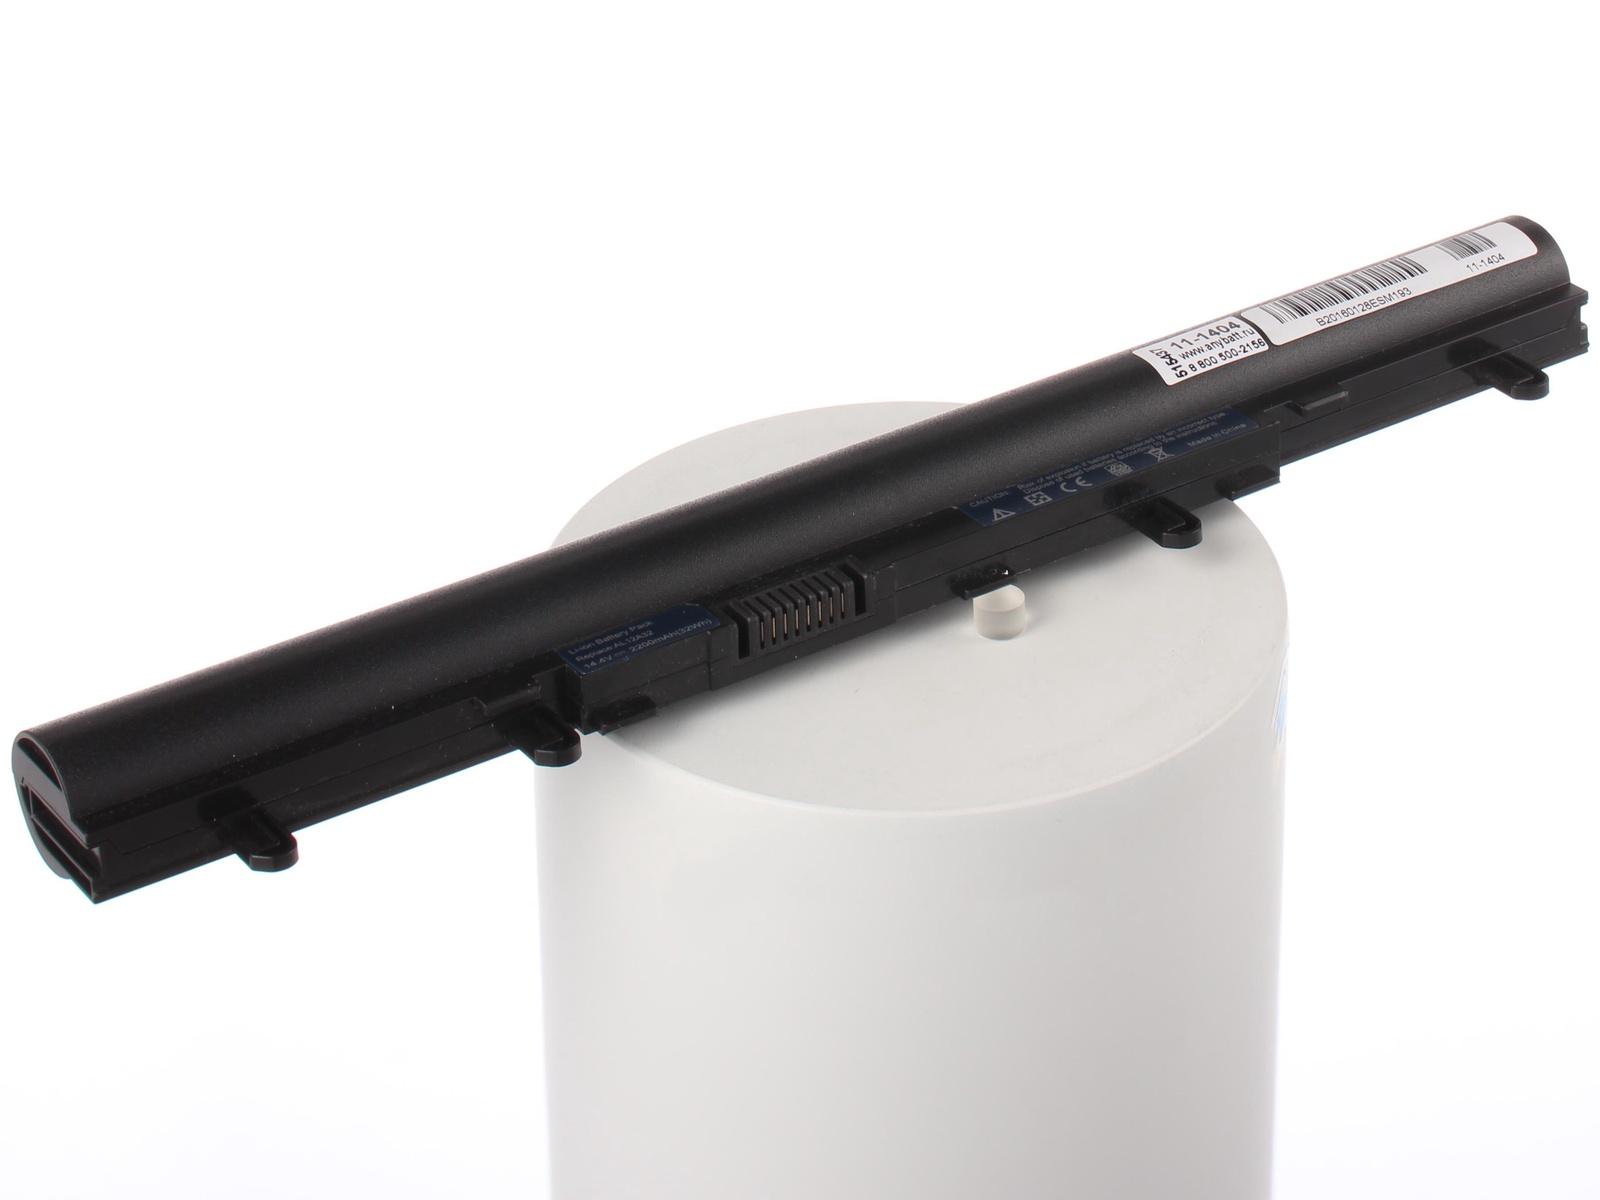 Аккумулятор для ноутбука AnyBatt для Acer Aspire V5-571G-53316G50Mass, Aspire V5-571G-53316G50Makk, Aspire V5-551G-64454G50Makk, Aspire E1-410-29204G1TMnkk, Aspire E1-572G-54204G50Mnkk, Aspire V5-551-84554G50Makk 15 6 laptop lcd matrix screen for acer aspire v5 551g v5 551 v5 531g v5 531 v5 571 v5 571g zr7 pew71 1366x768 40pin